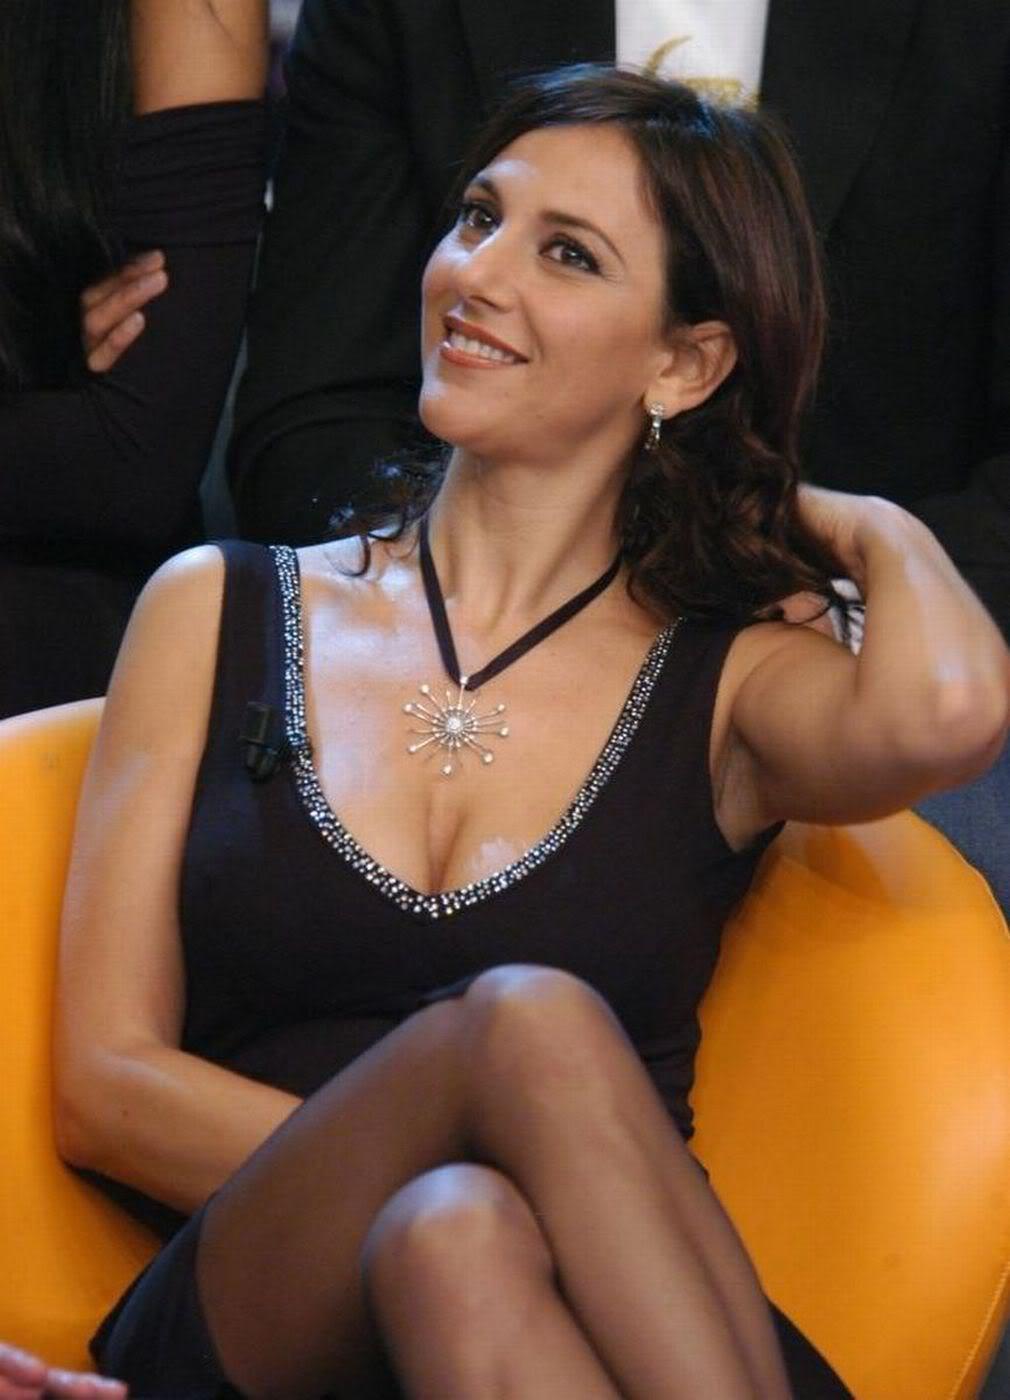 Claudia antonelli blowjob and fuck - 4 1